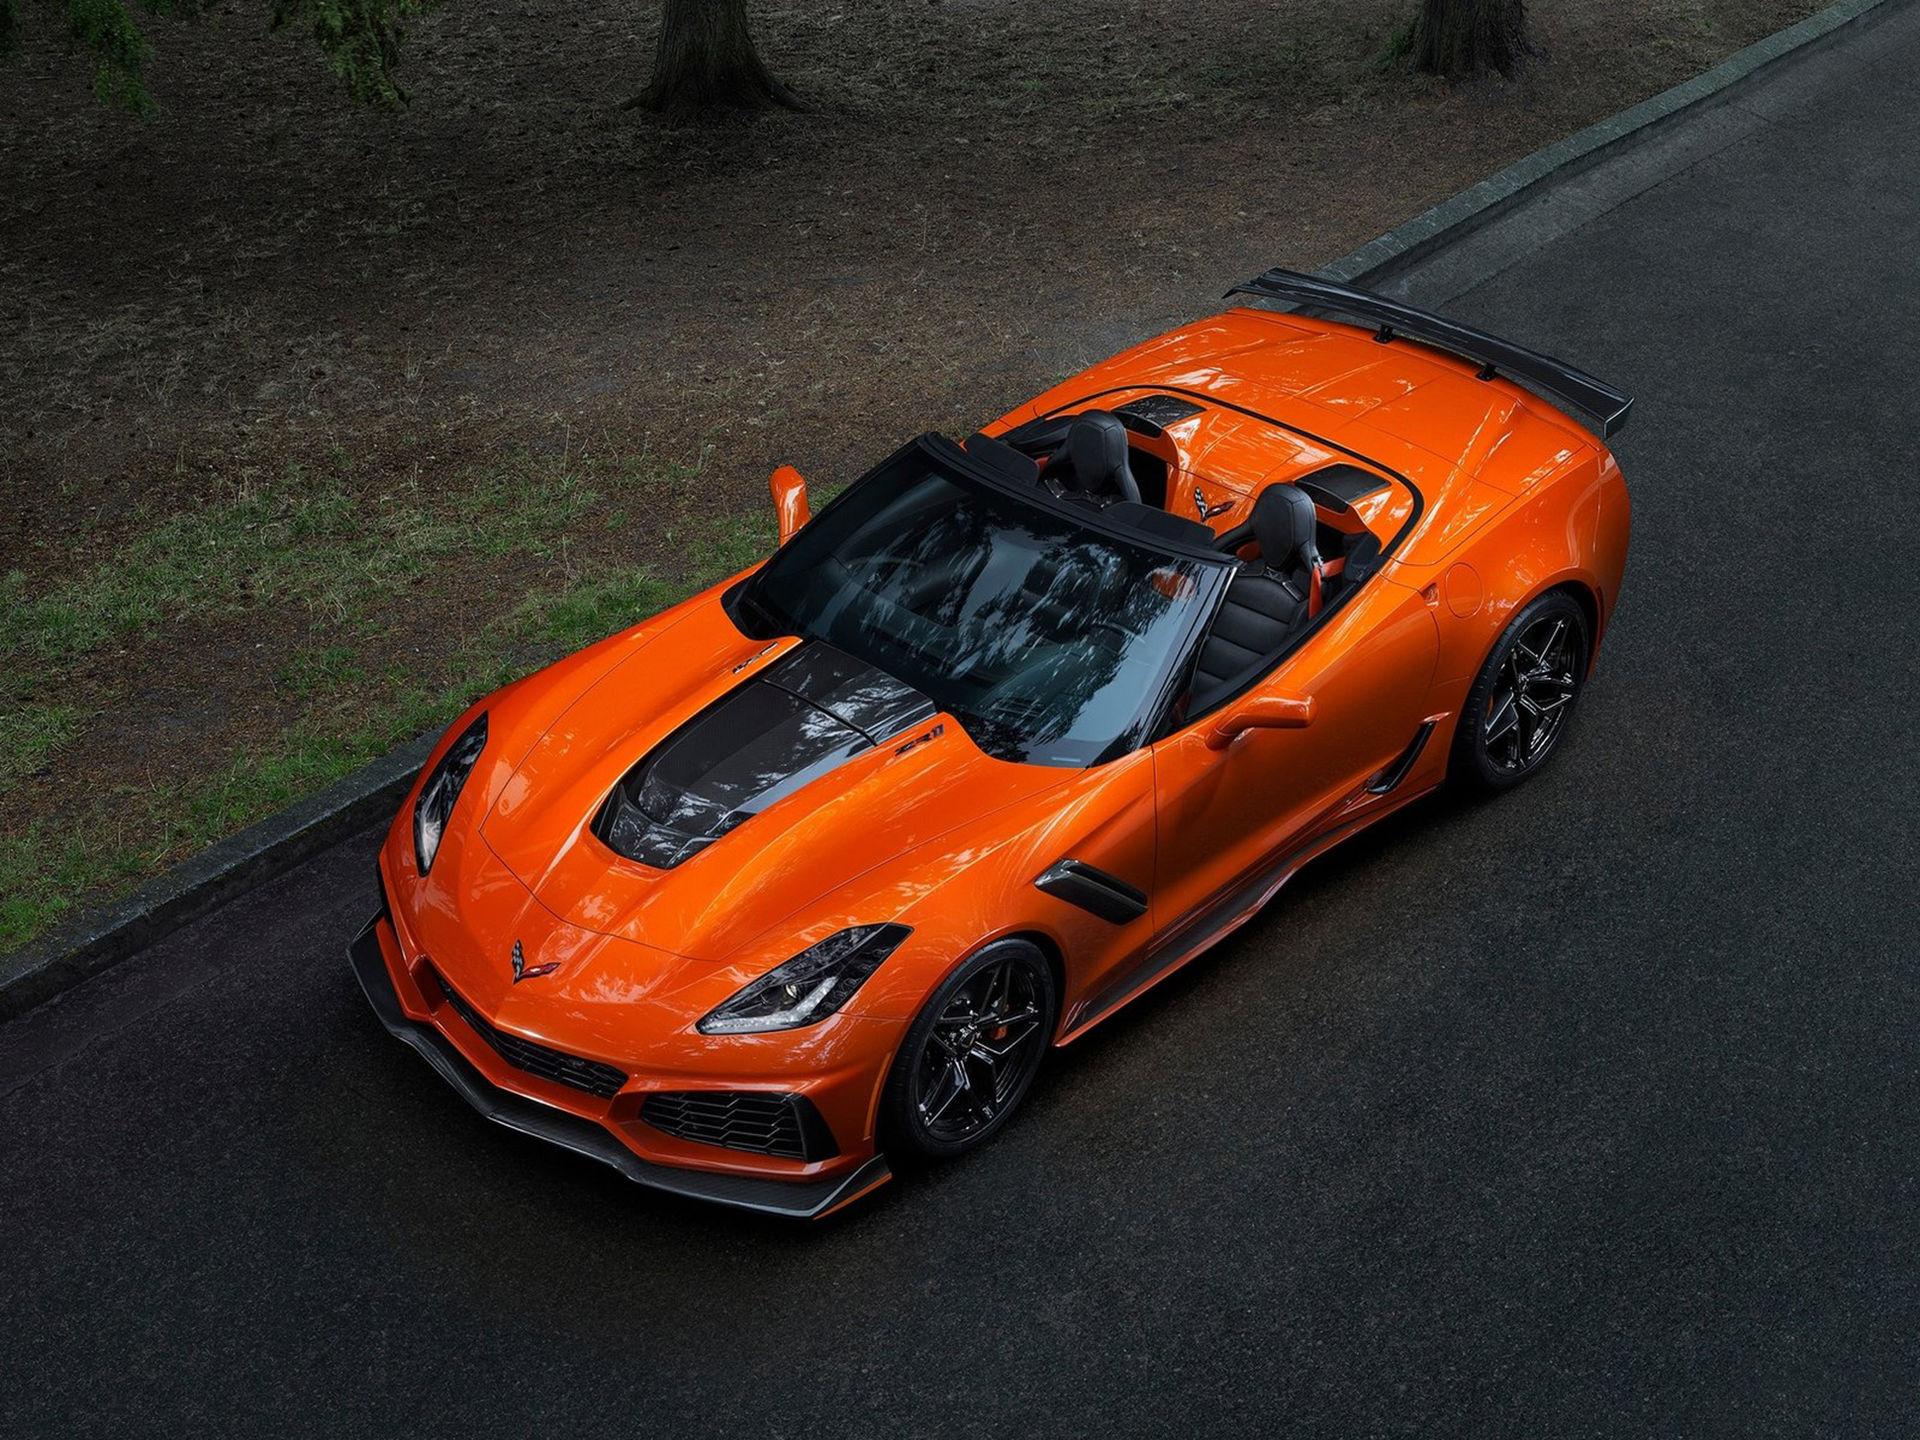 Nya Chevrolet Corvette ZR1 presenteras som cabriolet